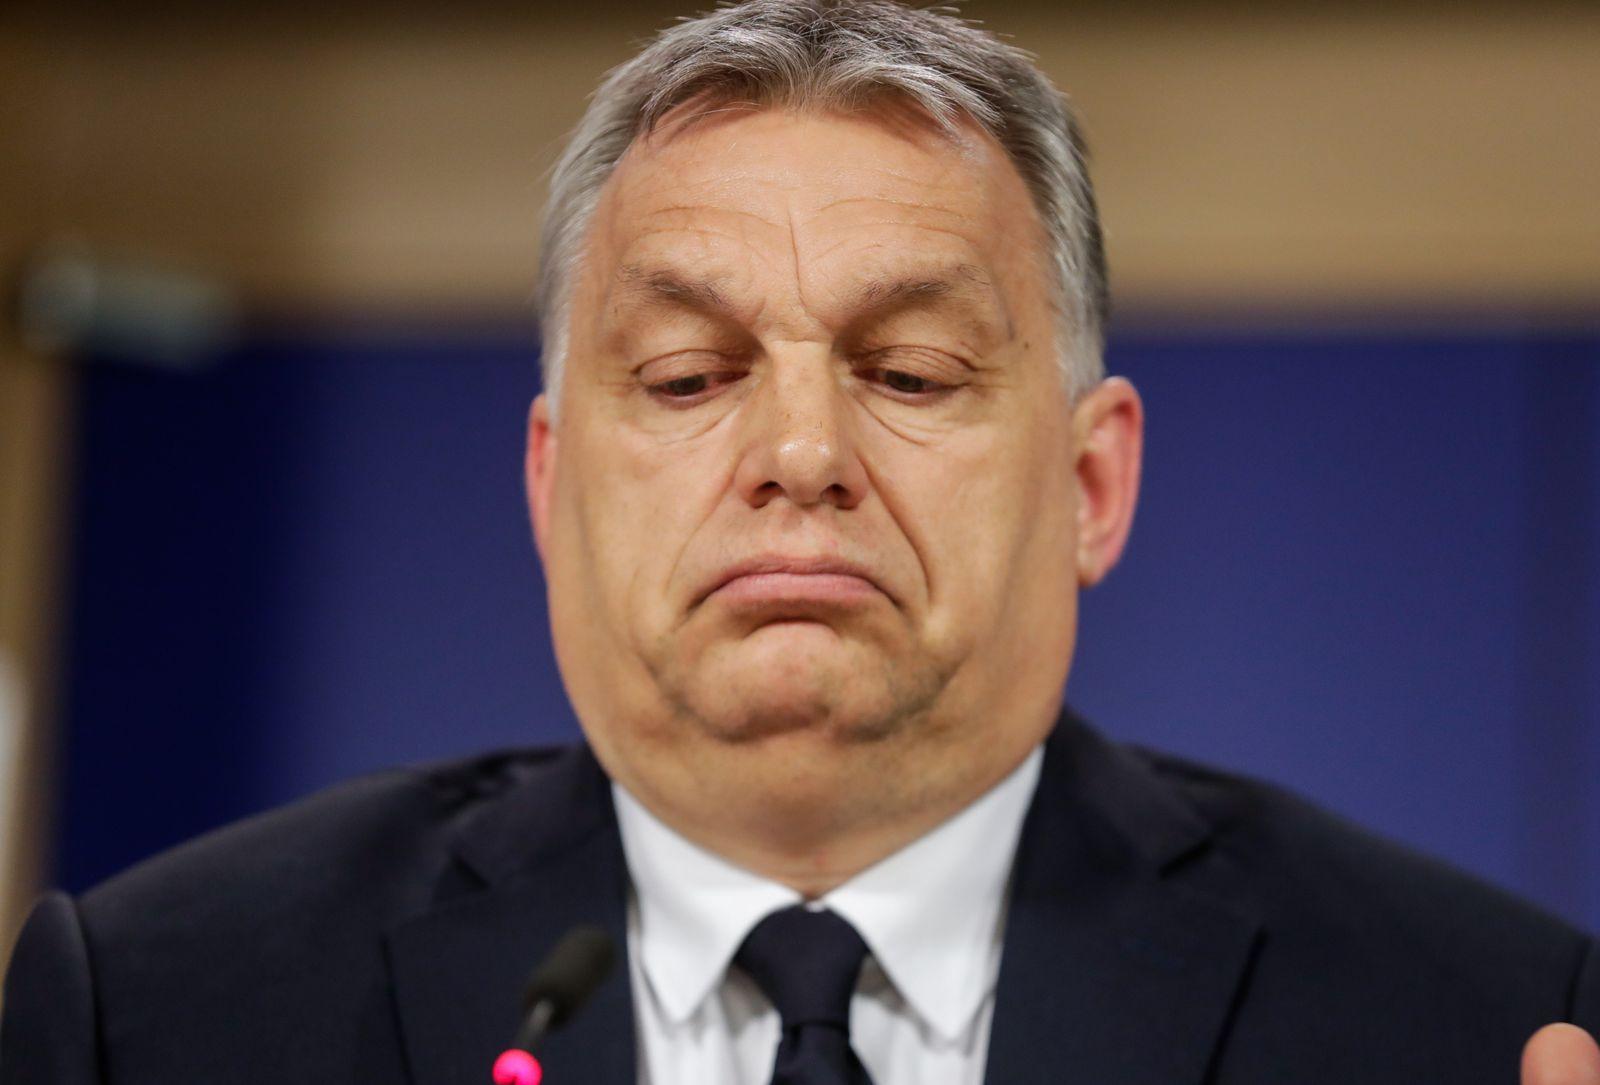 Fidesz party to leave European parliament centre-right group